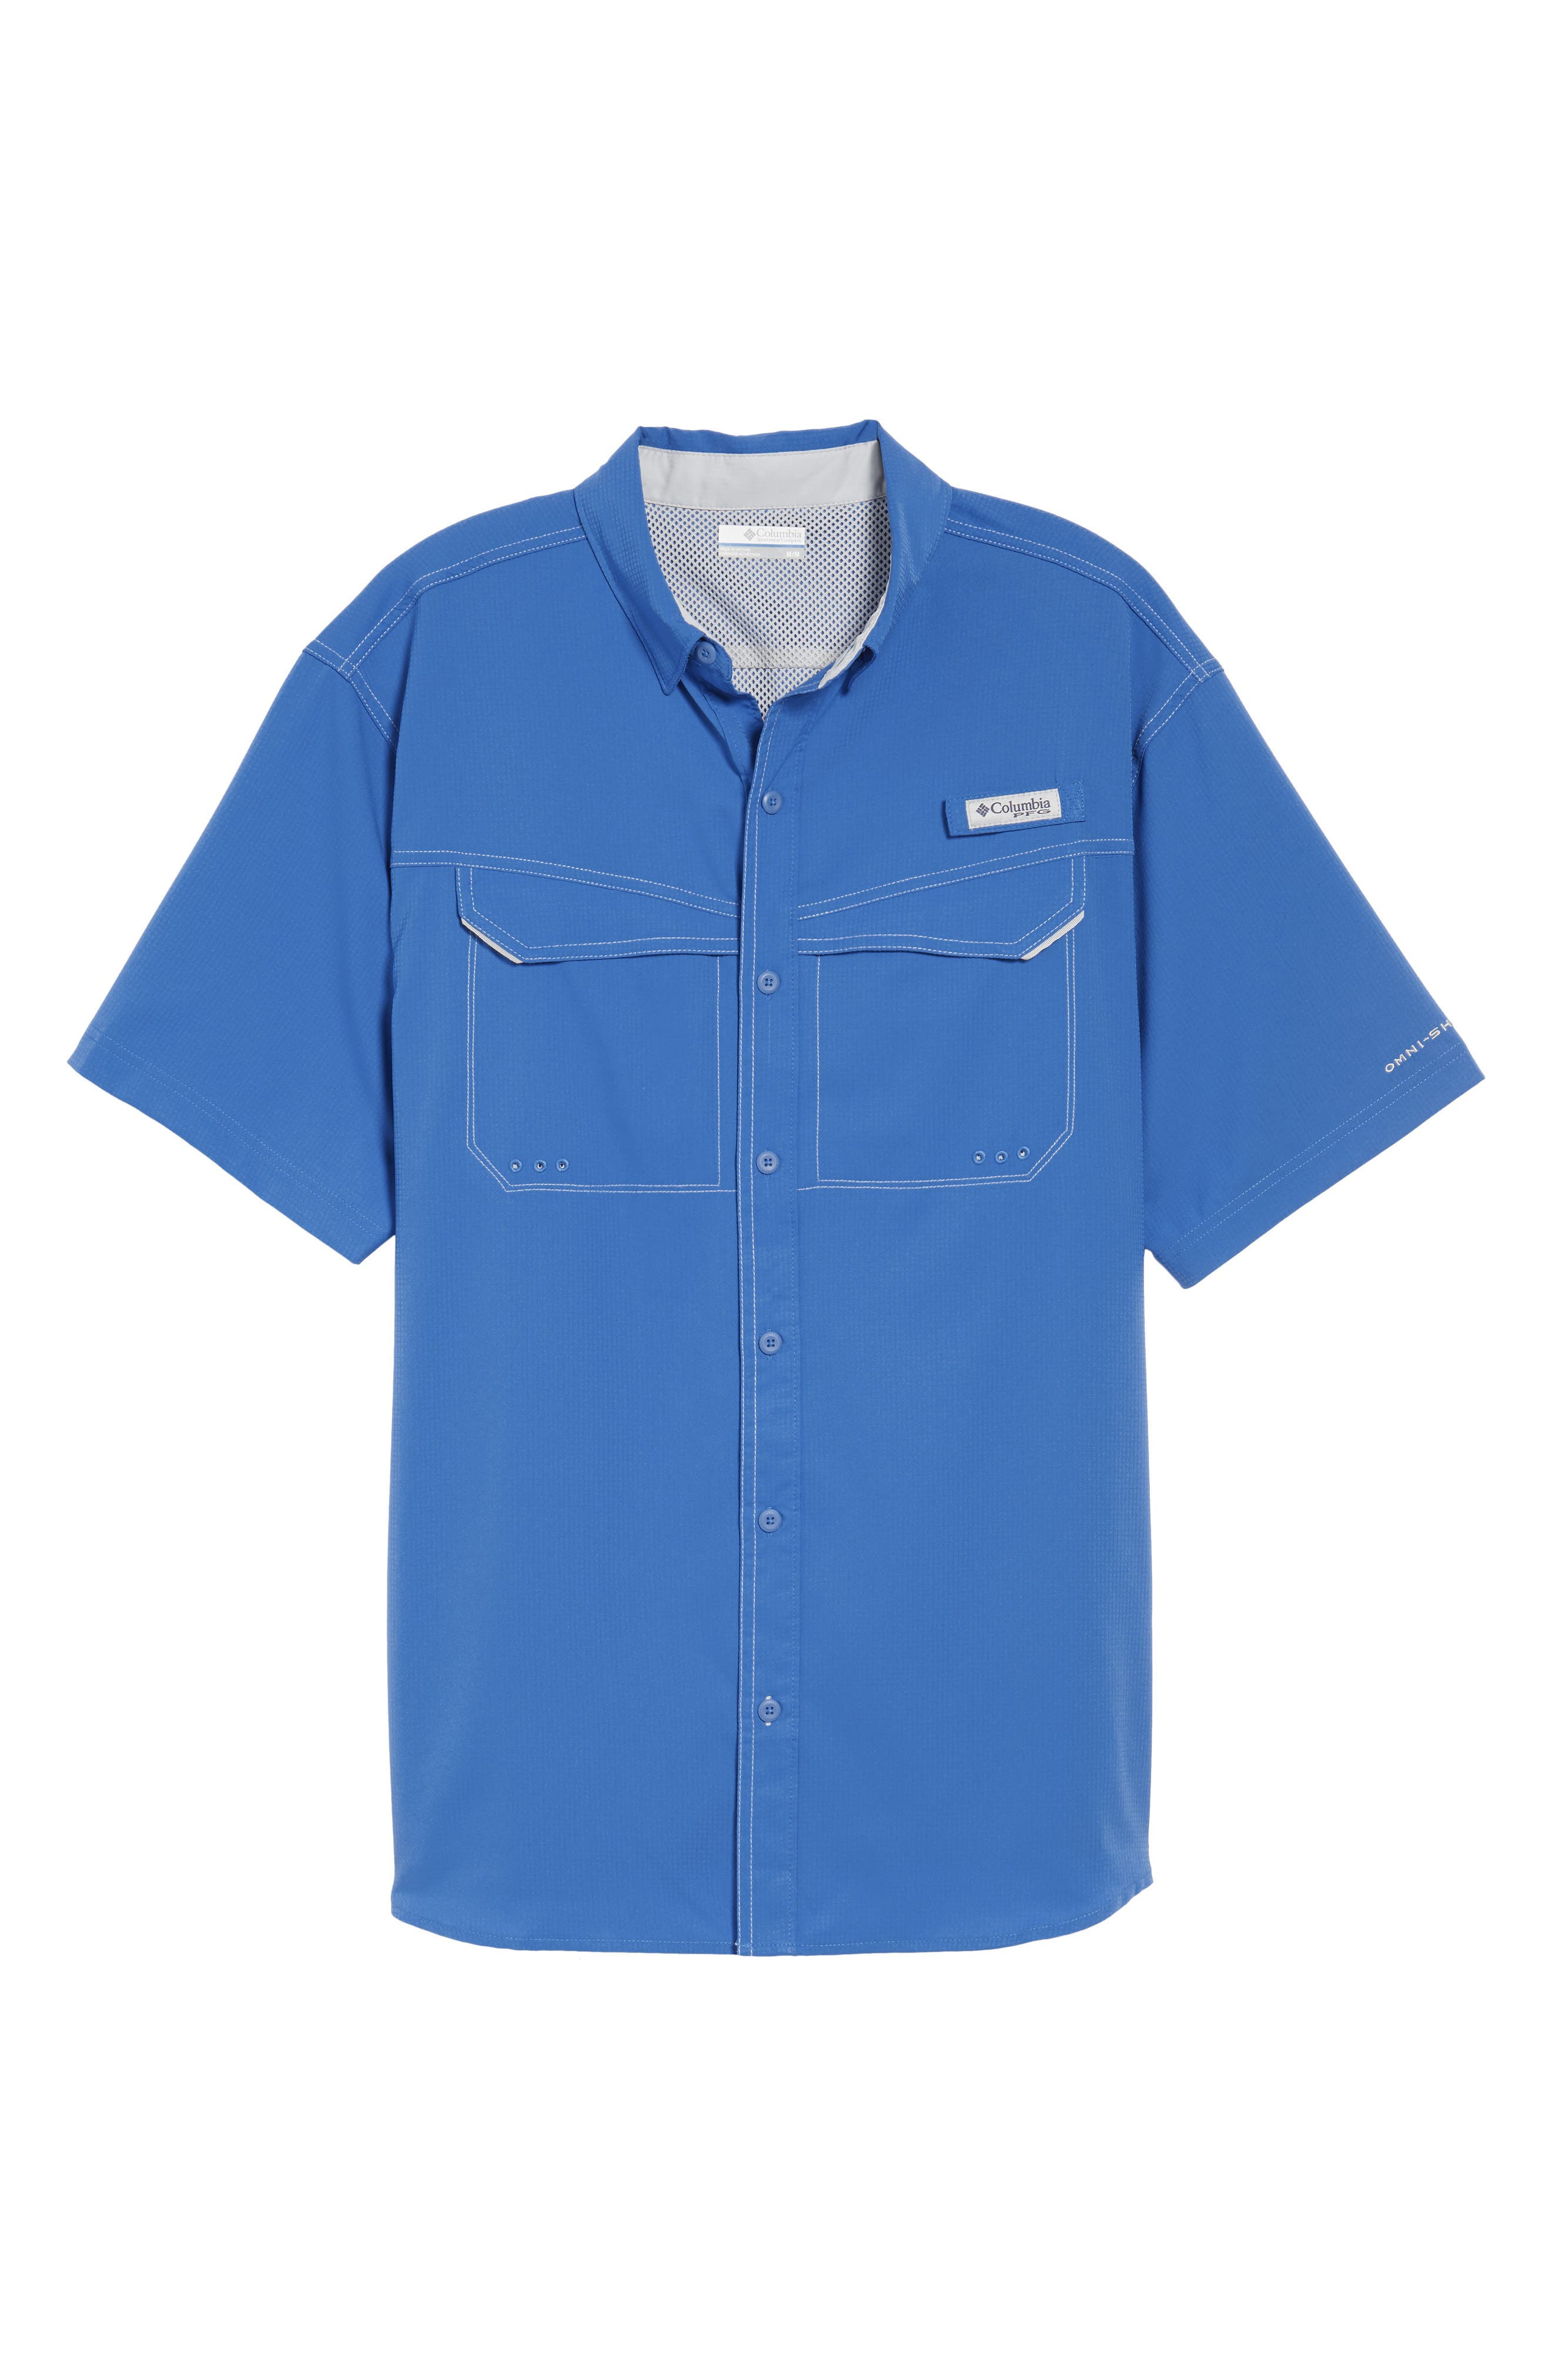 PFG Low Drag Offshore Woven Shirt,                             Alternate thumbnail 28, color,